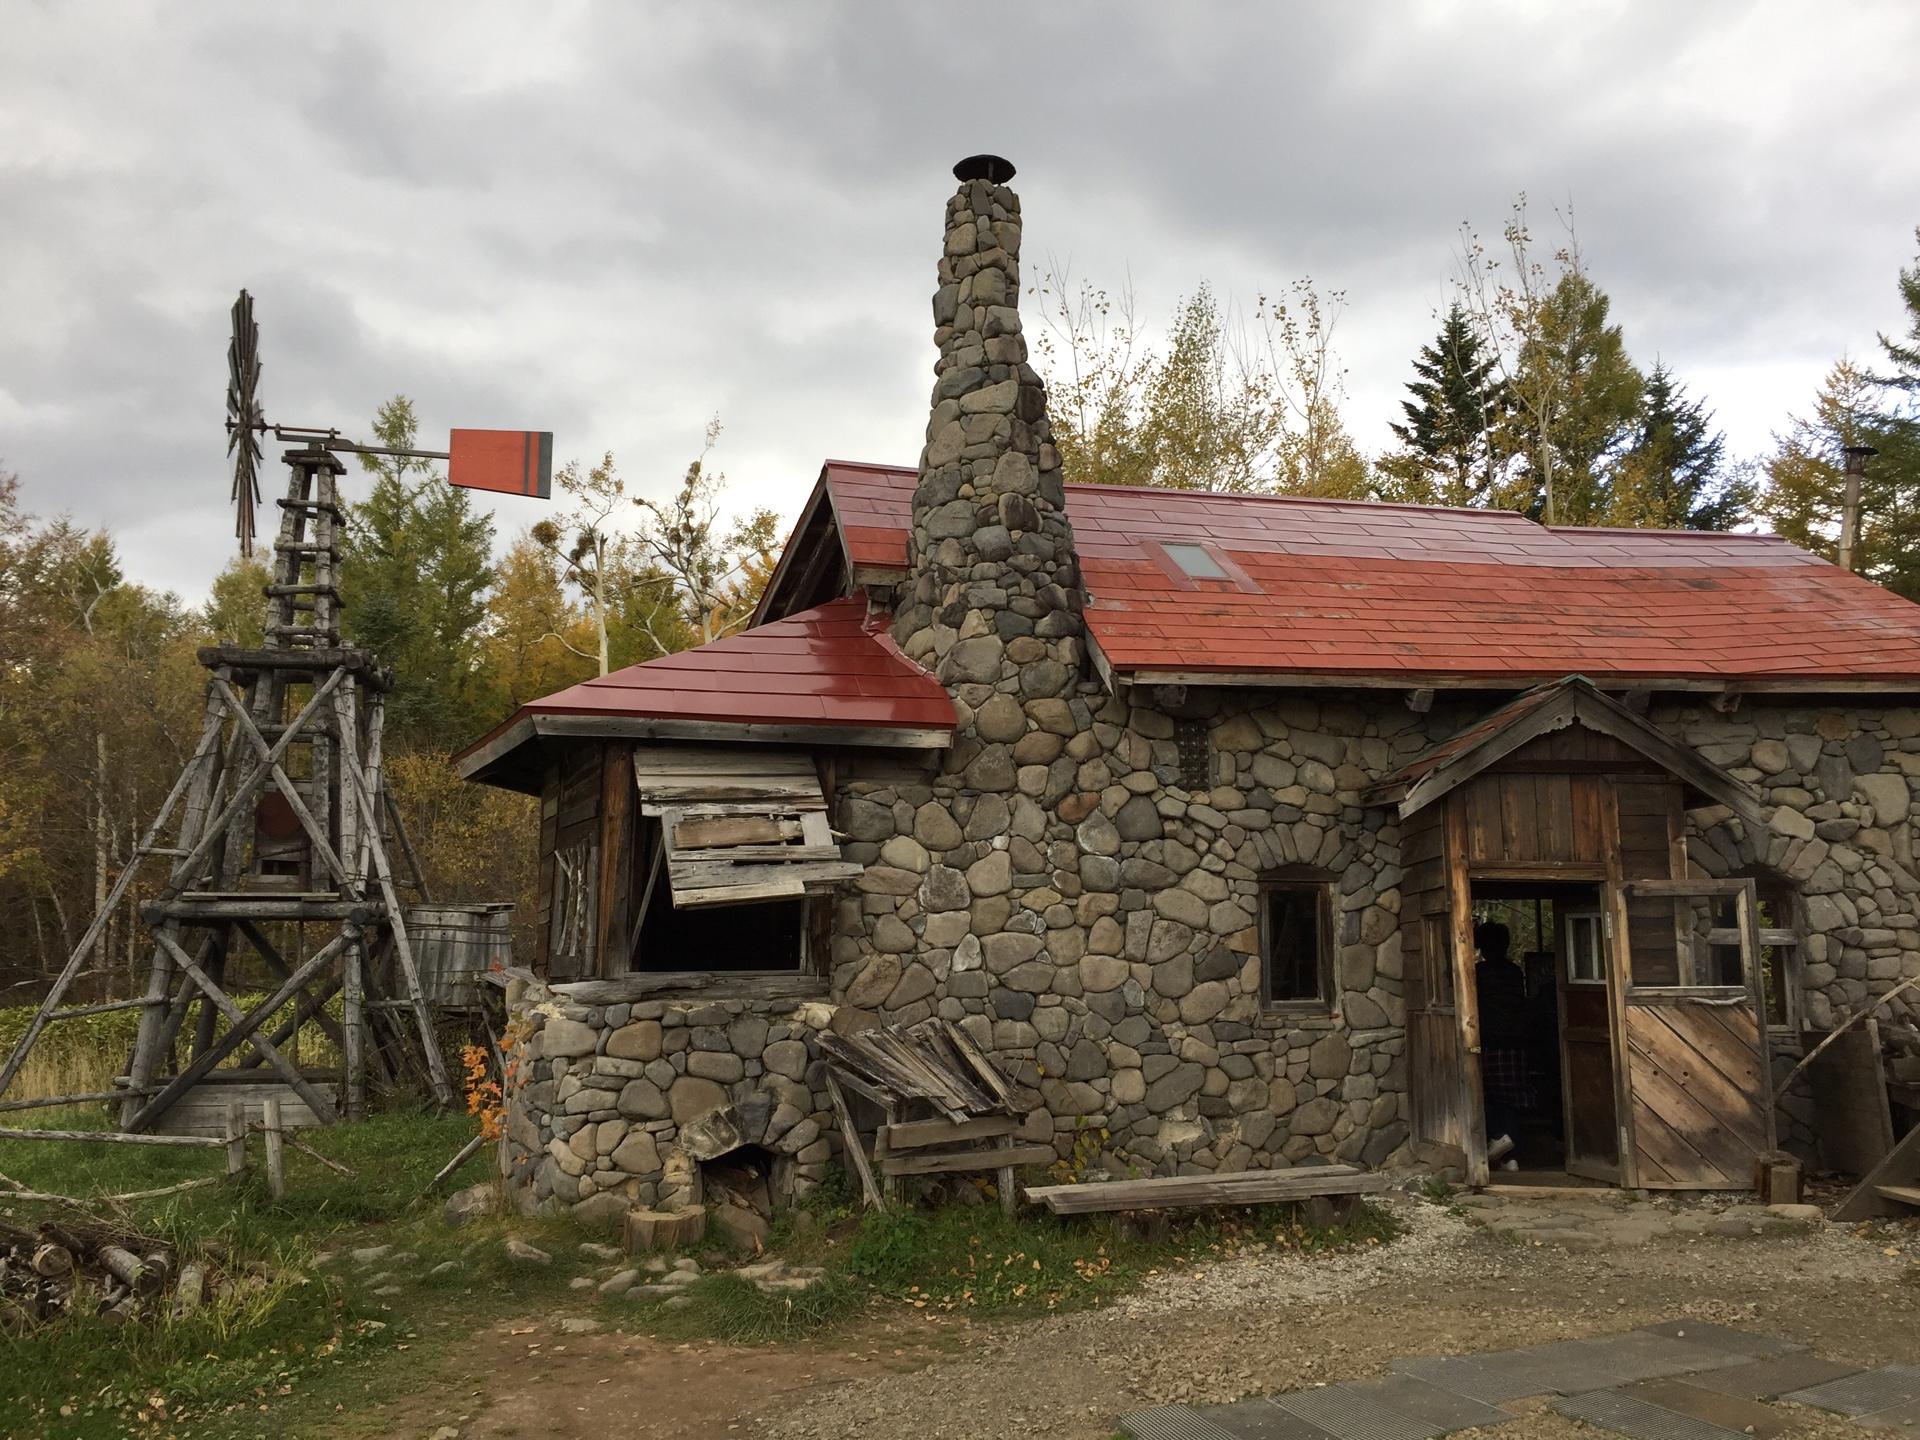 石の家 富良野 観光案内 観光情報